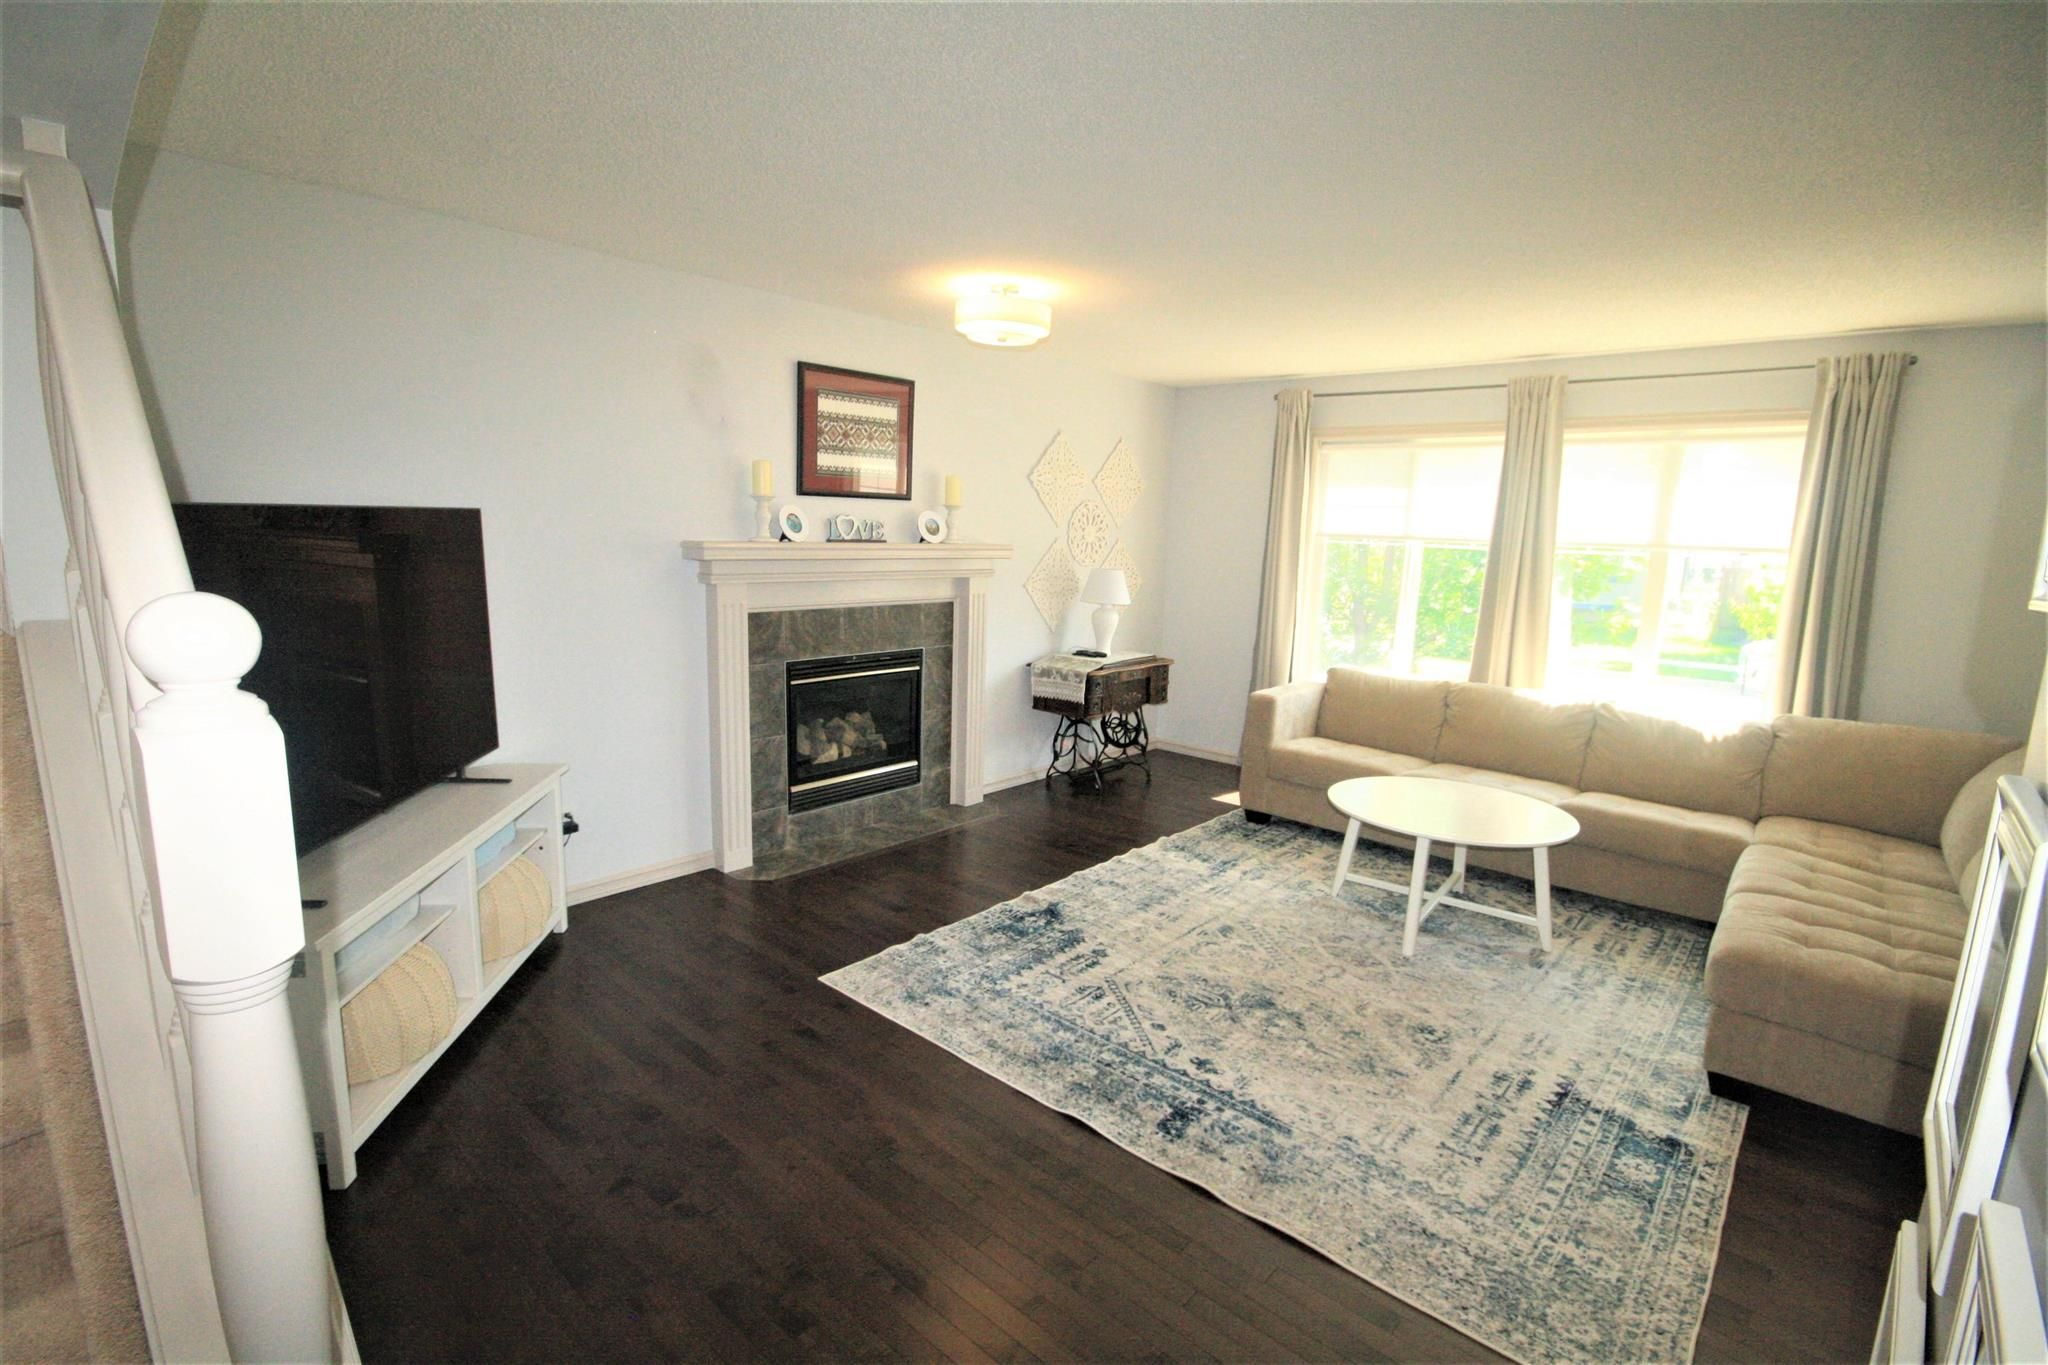 Main Photo: 1142 36A Avenue in Edmonton: Zone 30 House for sale : MLS®# E4250623